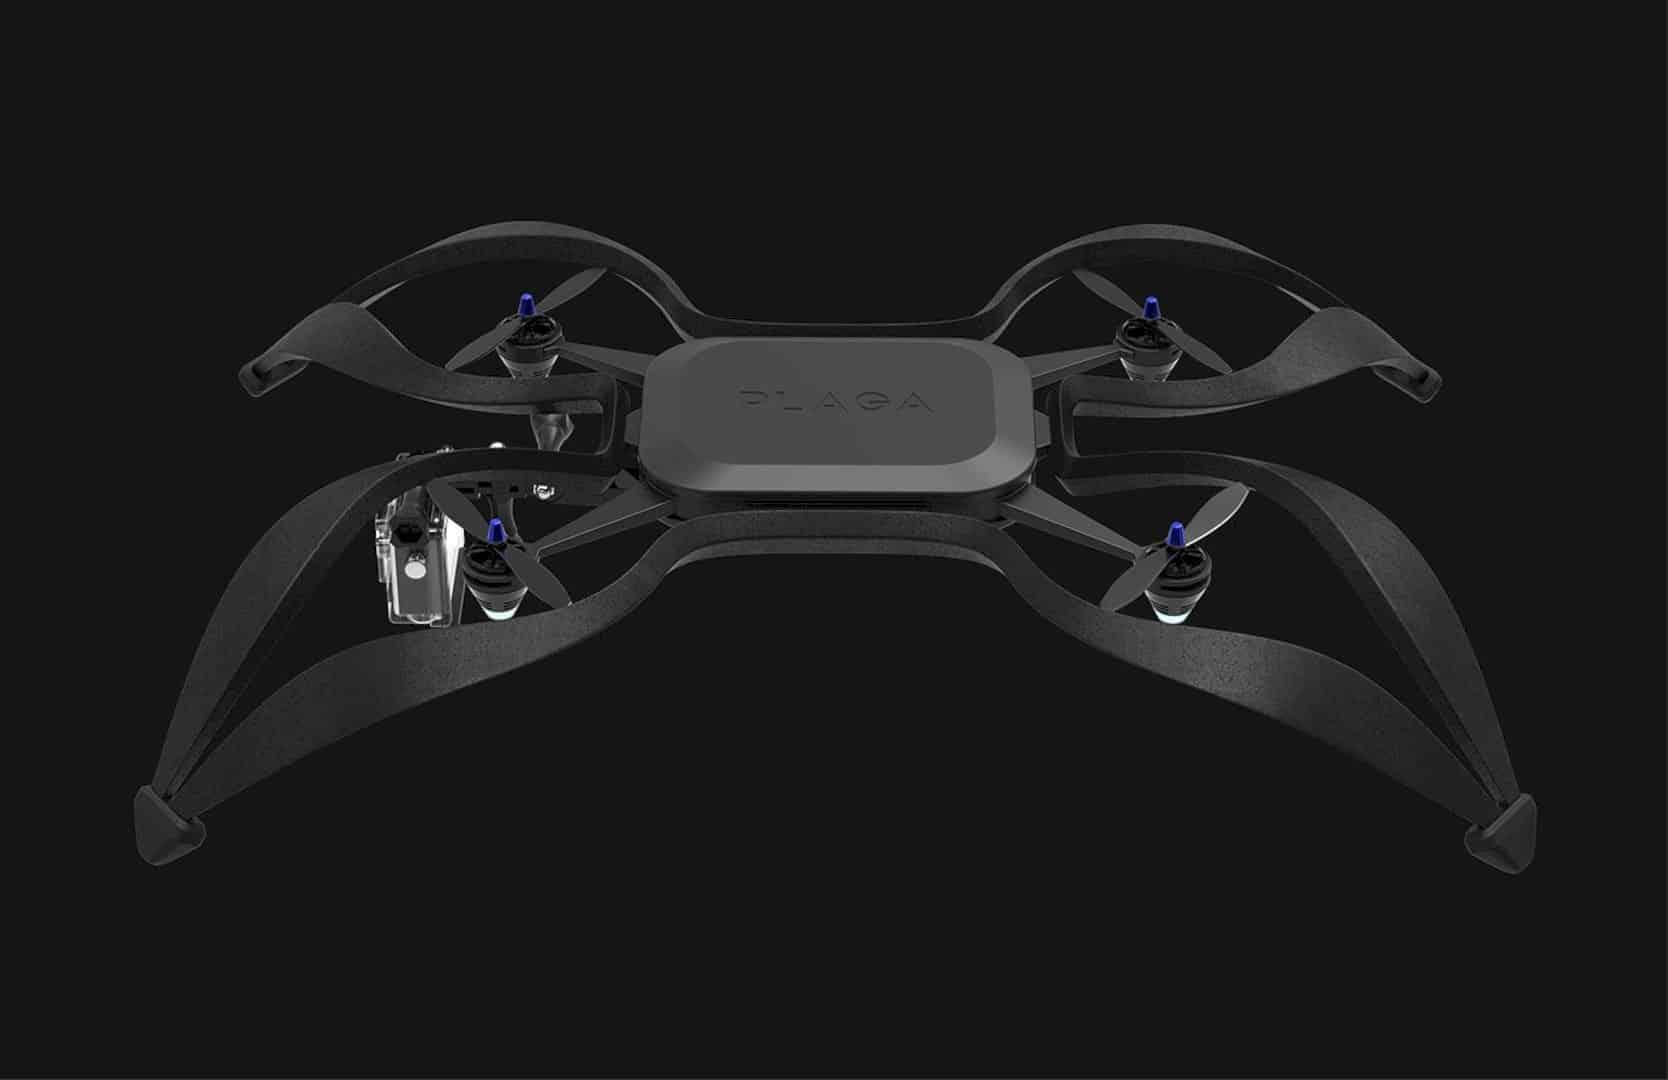 PLAGA Drone 12